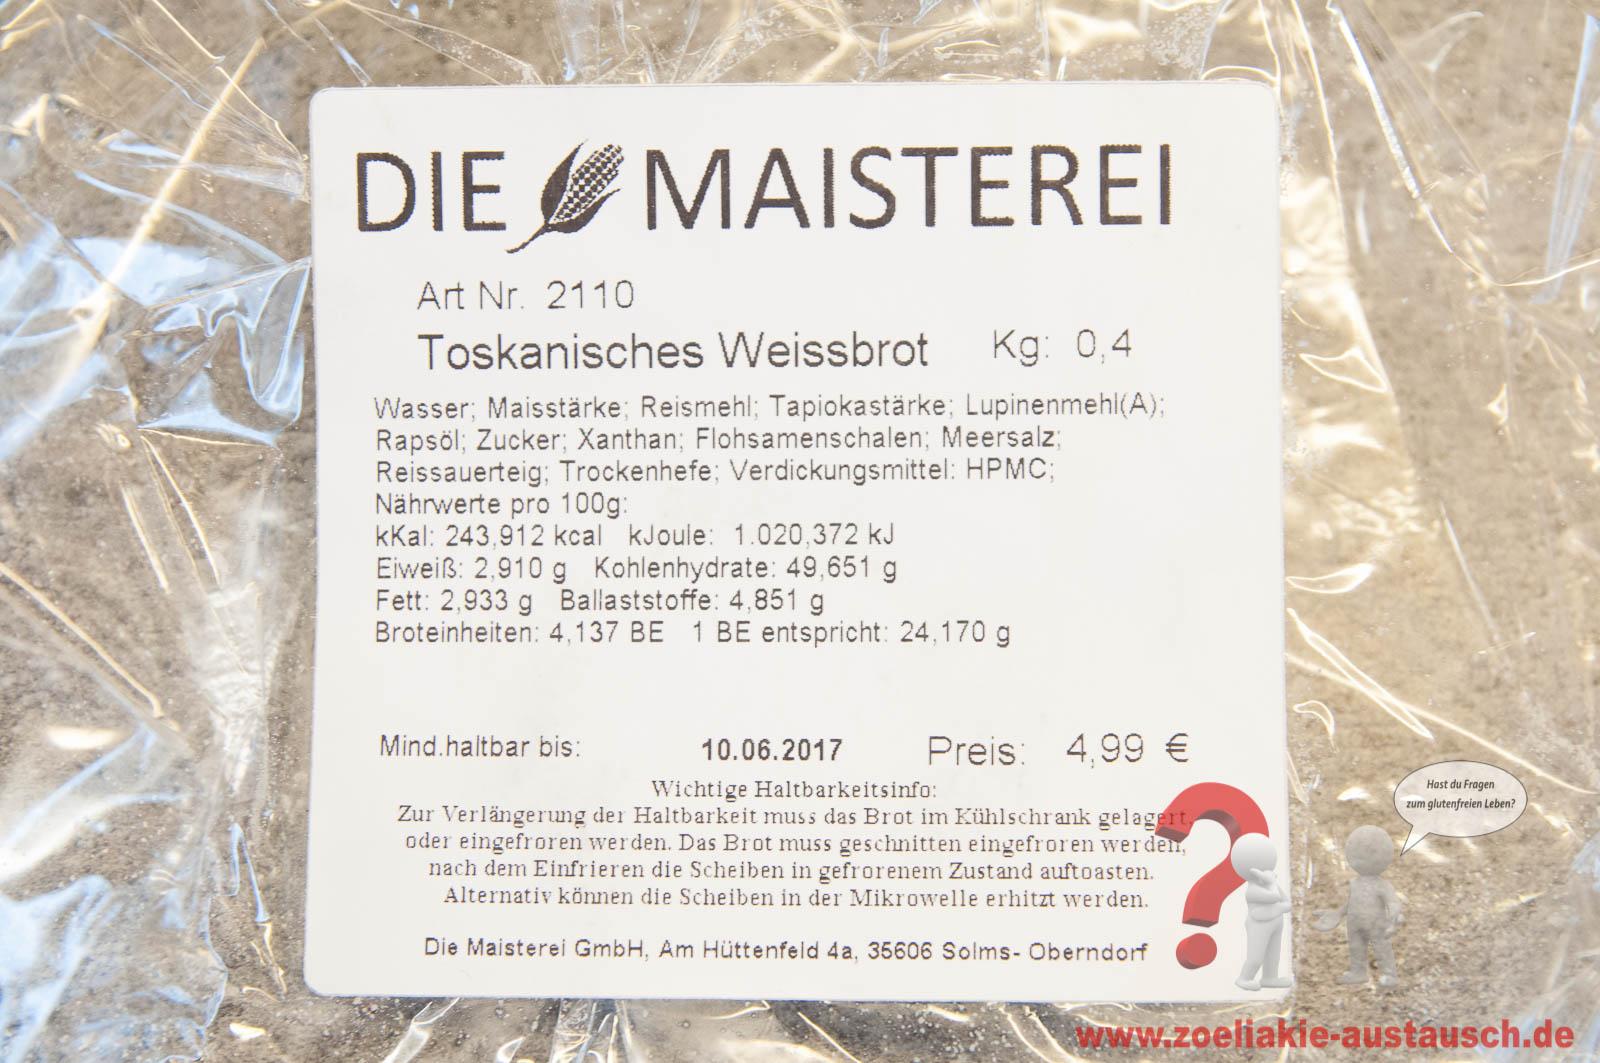 Zoeliakie-Austausch_Maisterei_10